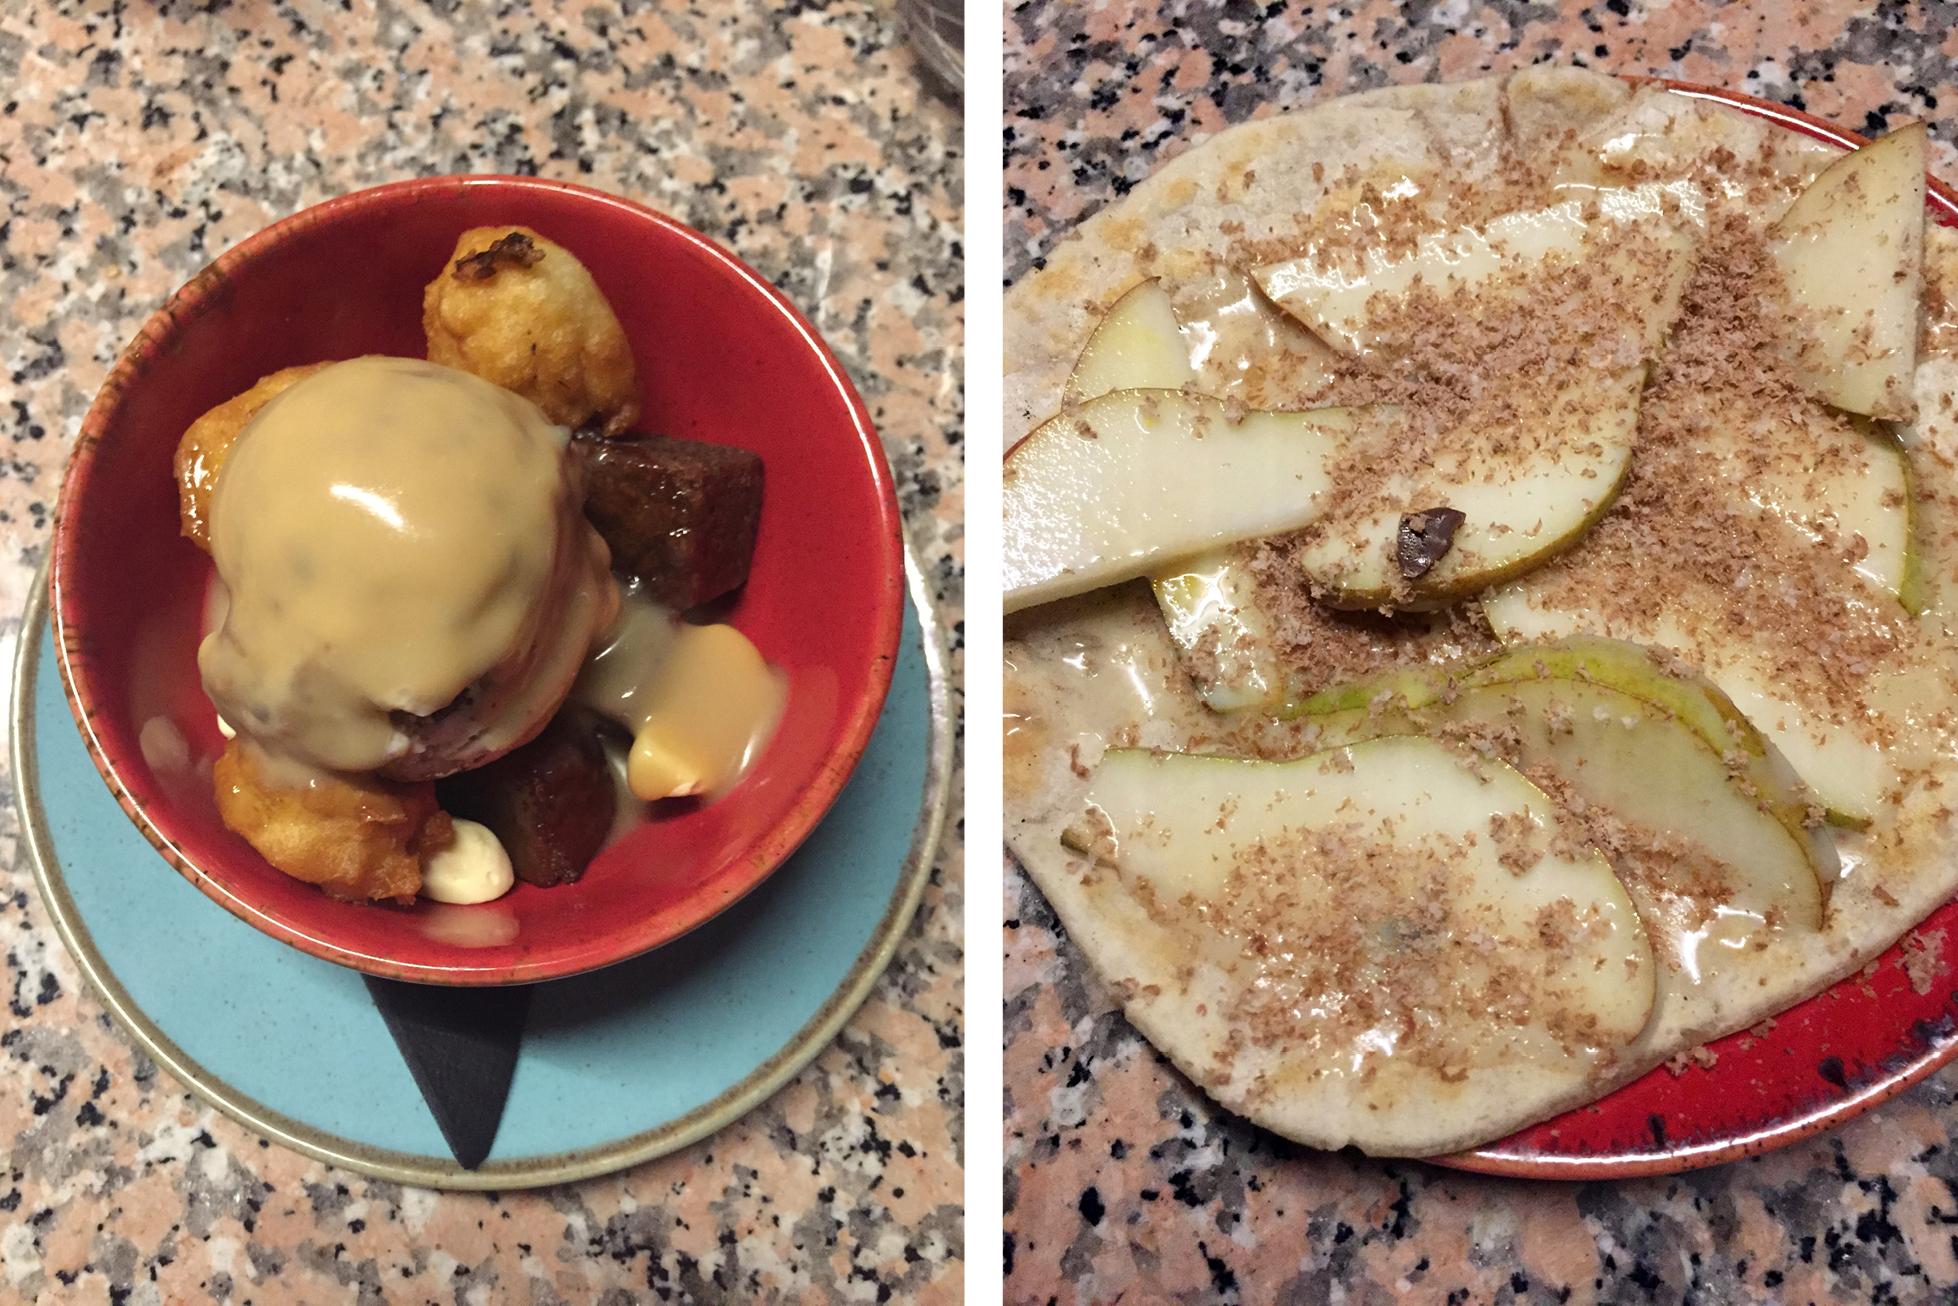 Temper restaurant dessert